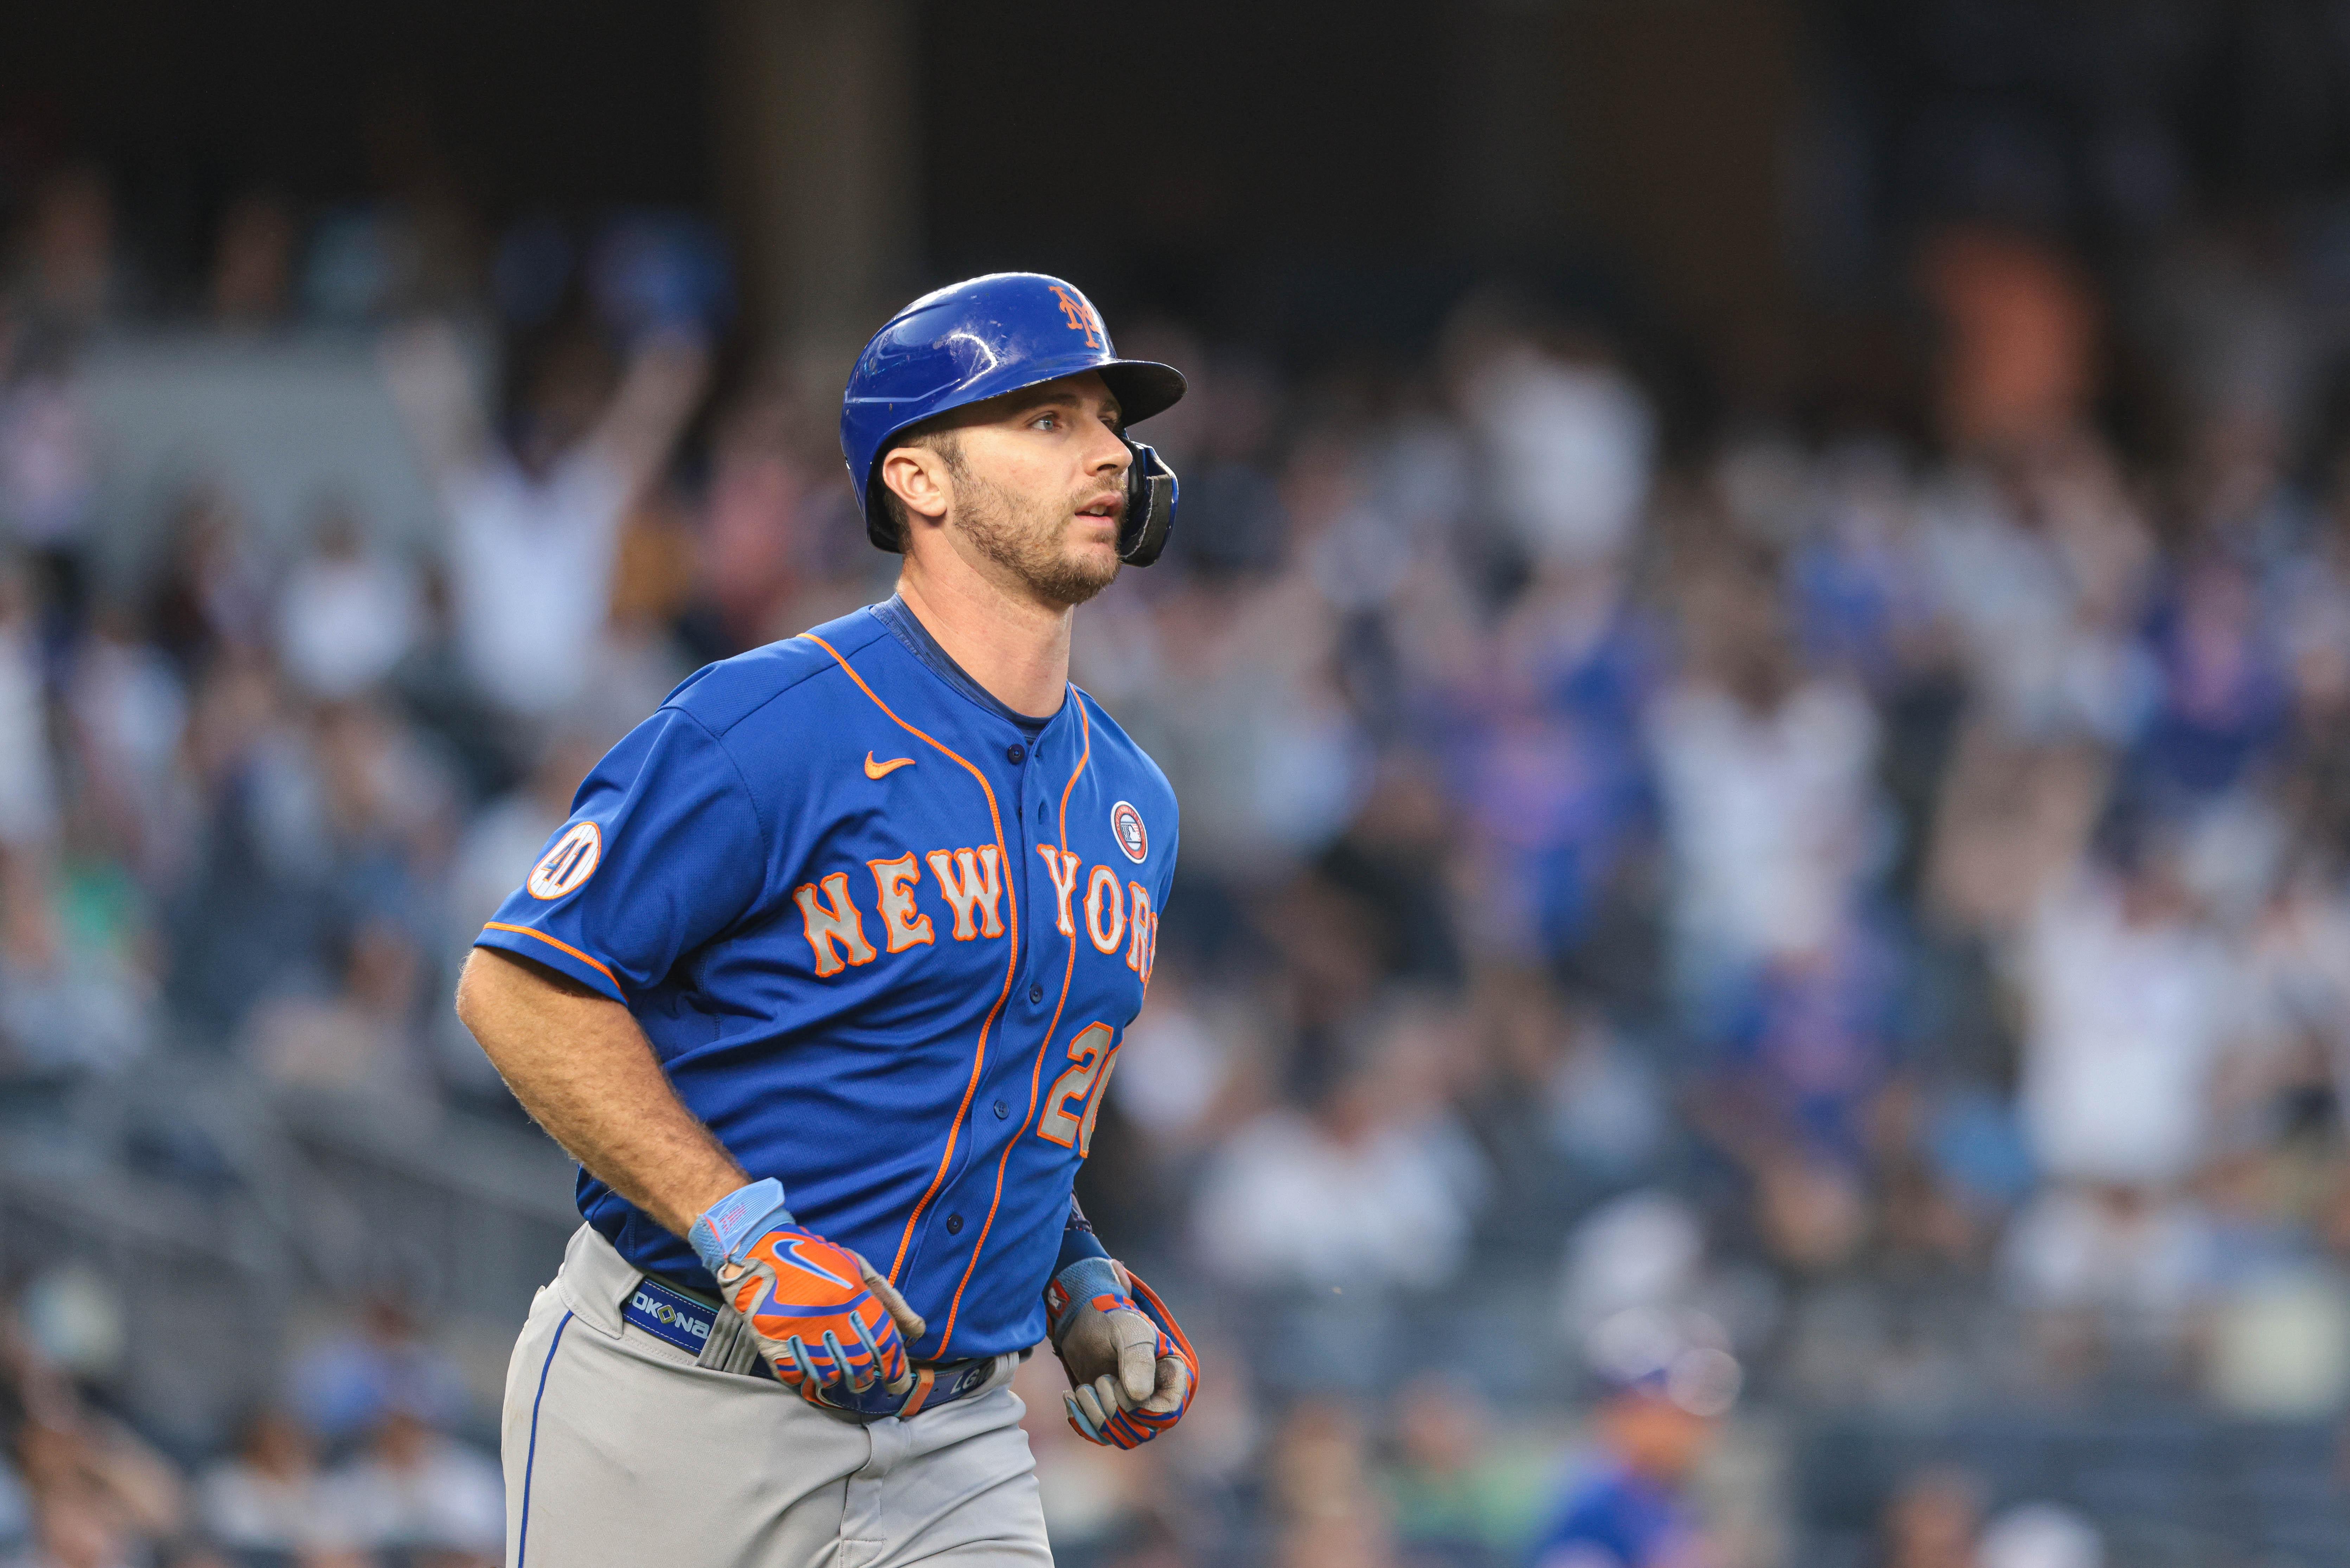 New York Mets at the All-Star Break: Revisiting Preseason Predictions